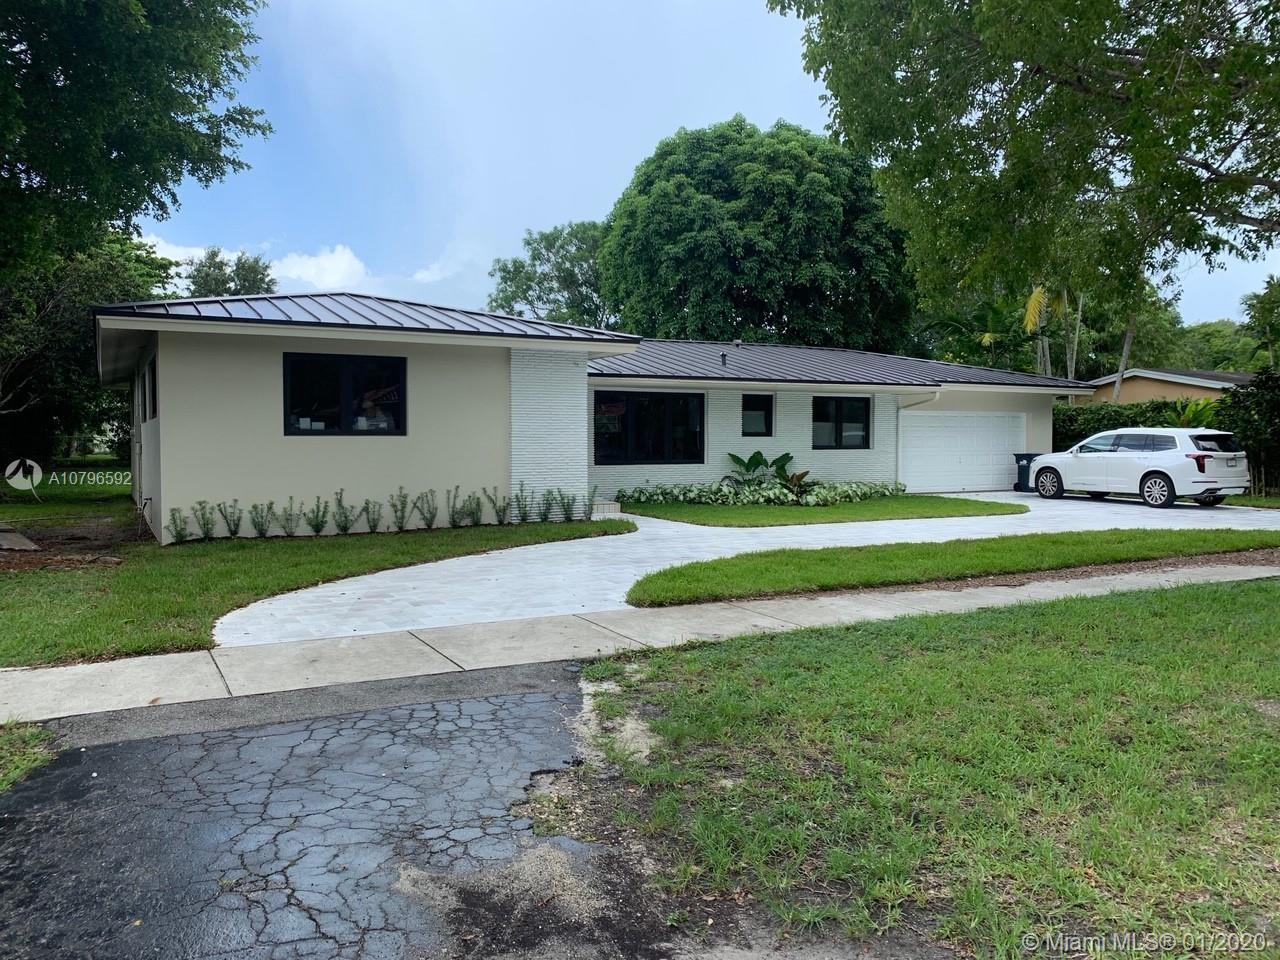 5750 SW 80th St, South Miami, FL 33143